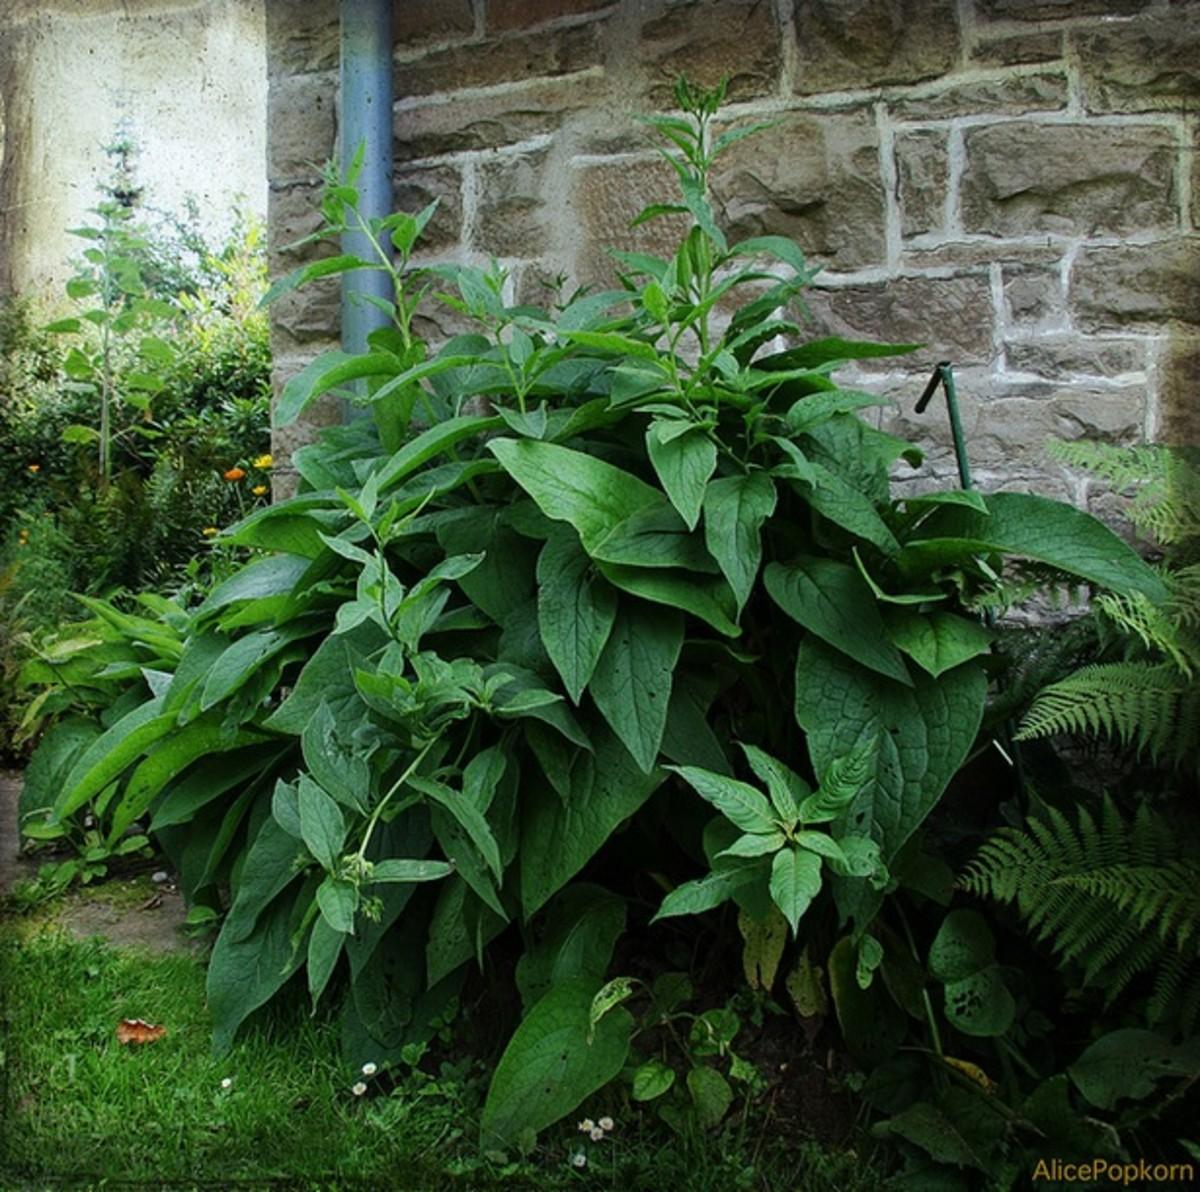 comfrey-root-uses-and-benefits-the-medicinal-properties-of-comfrey